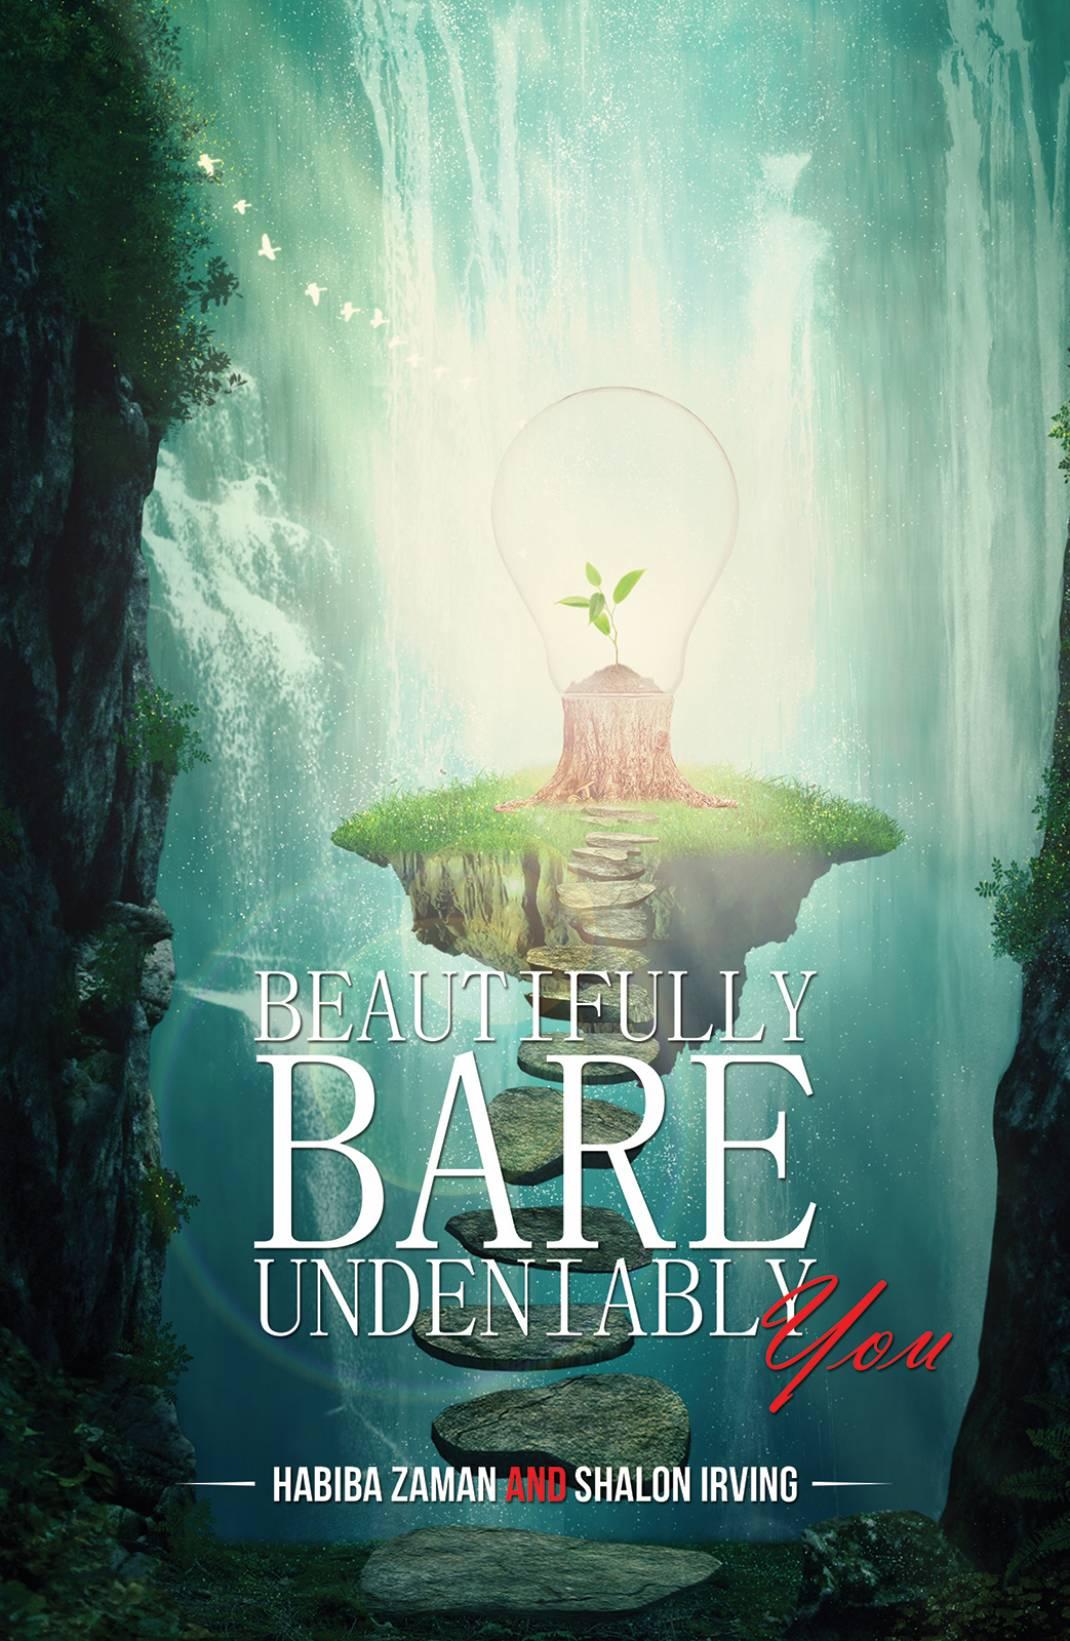 Beautifully Bare, Undeniably You